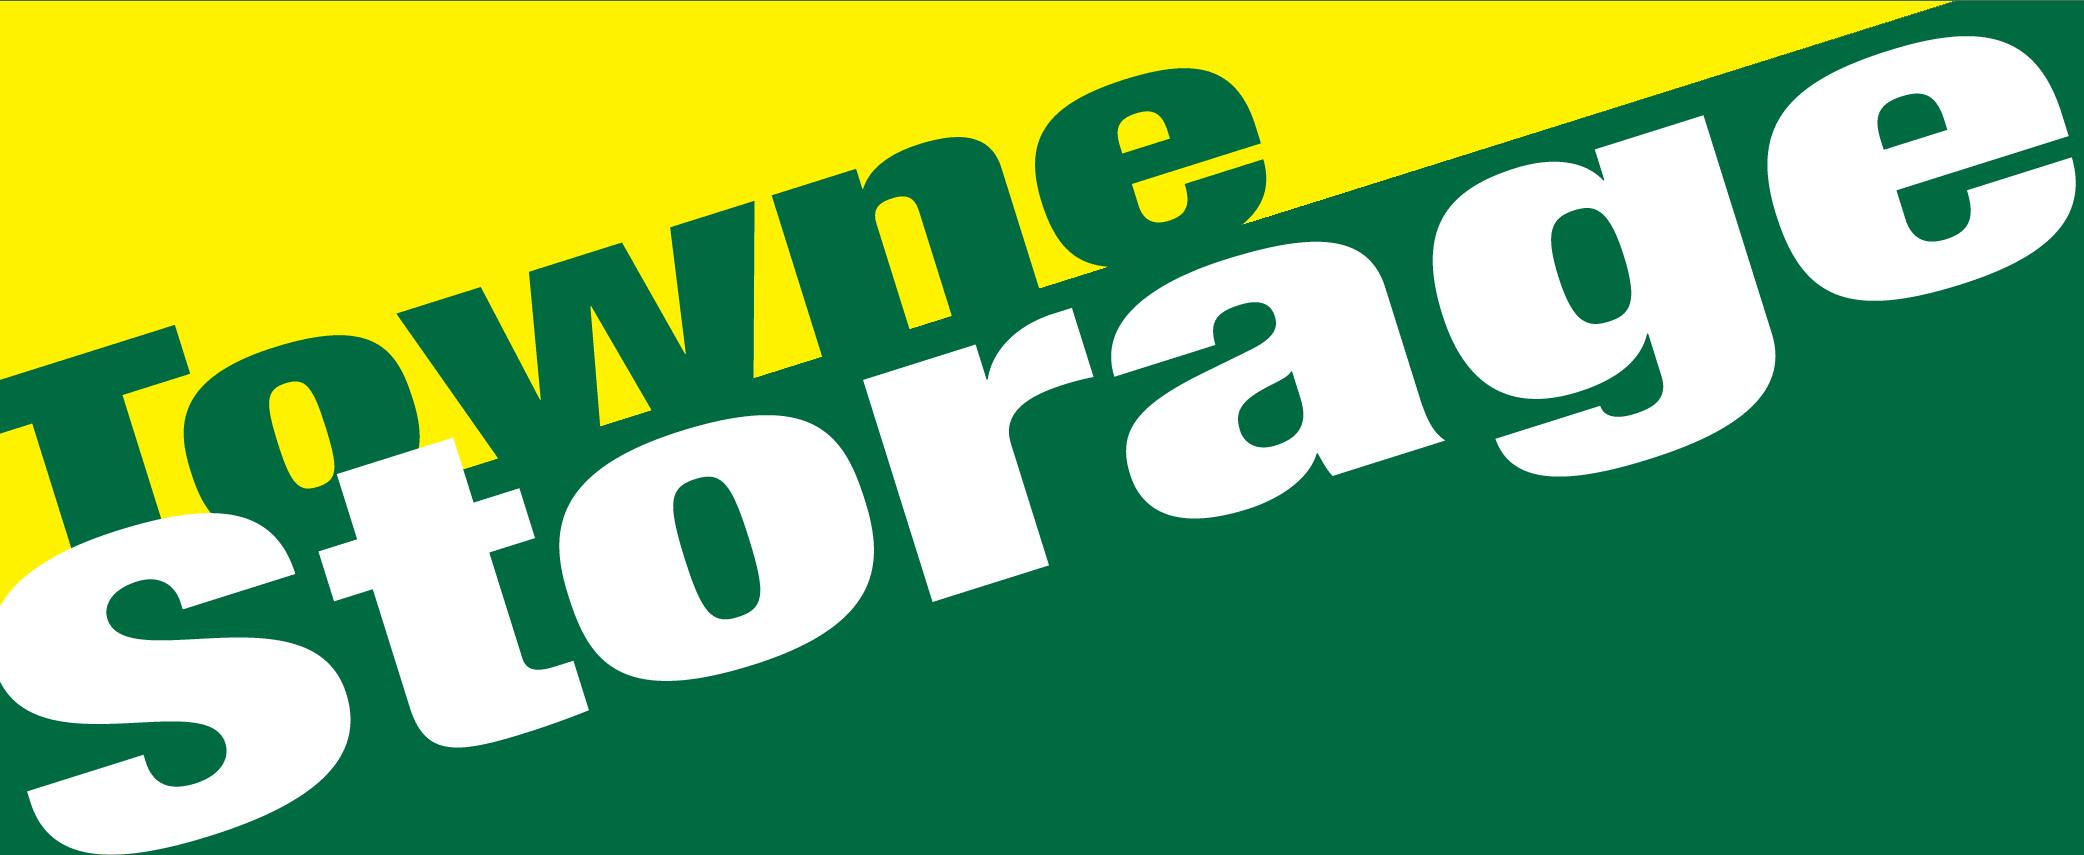 Towne Storage - Ft. Apache logo